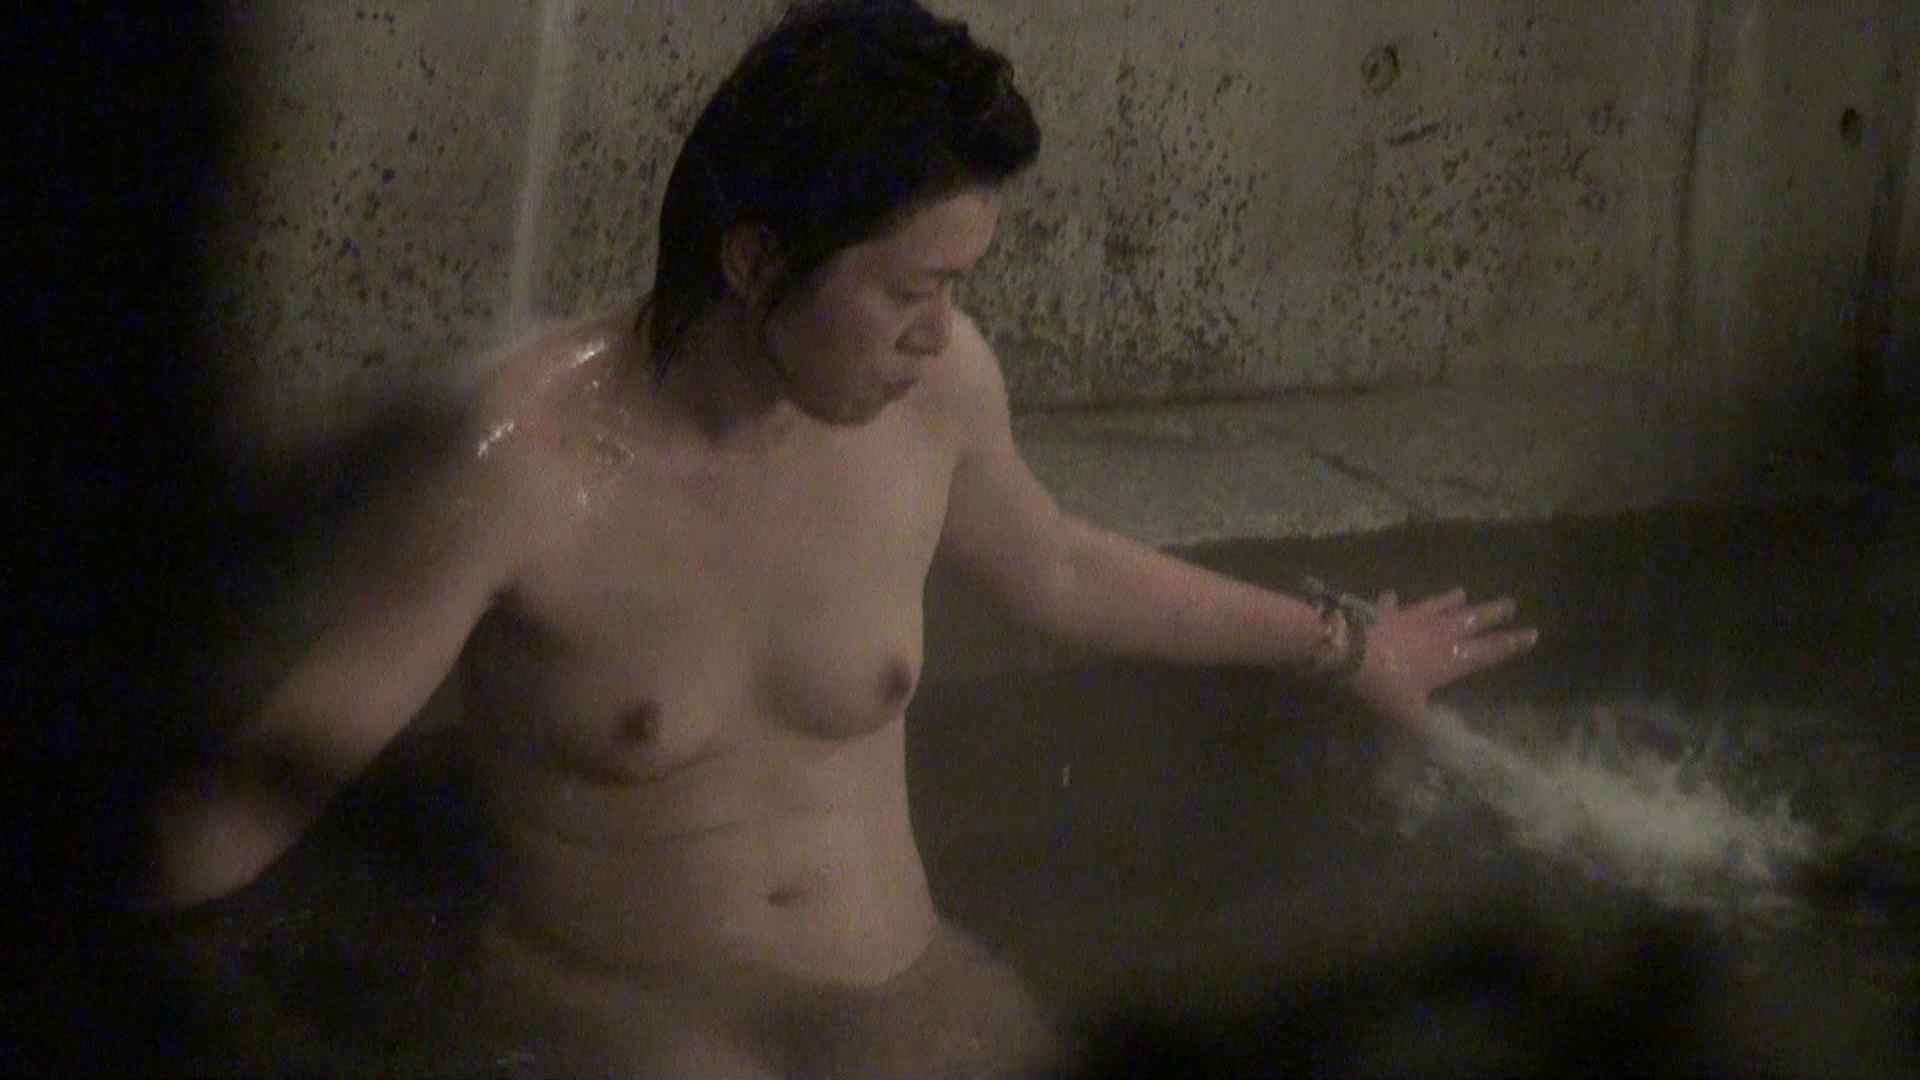 Aquaな露天風呂Vol.409 盗撮 すけべAV動画紹介 85枚 53